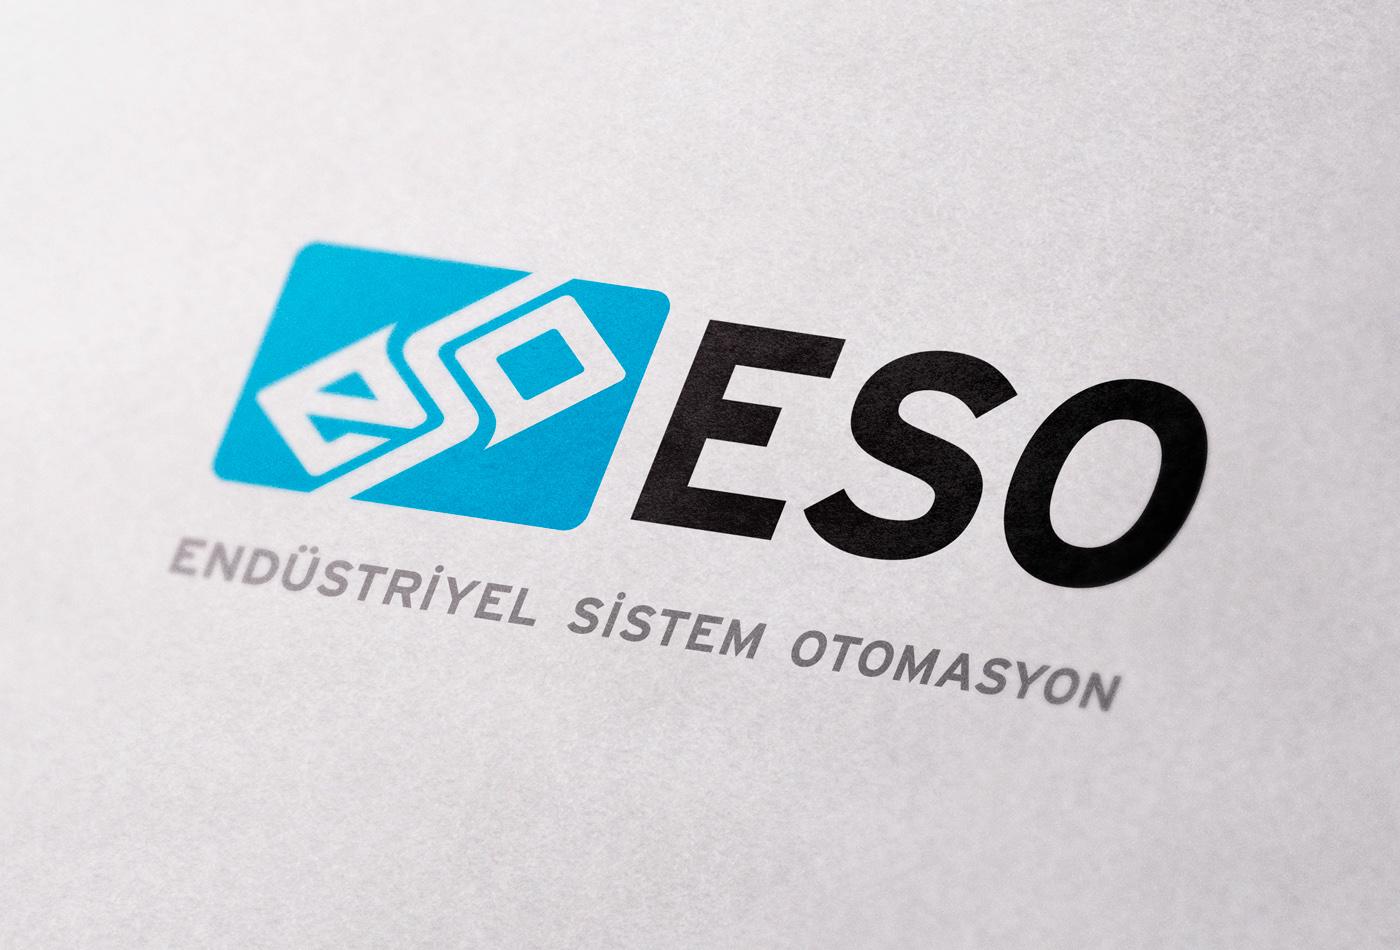 amblem endüstriyel eso font irsaliye kartvizit kimlik kurumsal logo tasarım